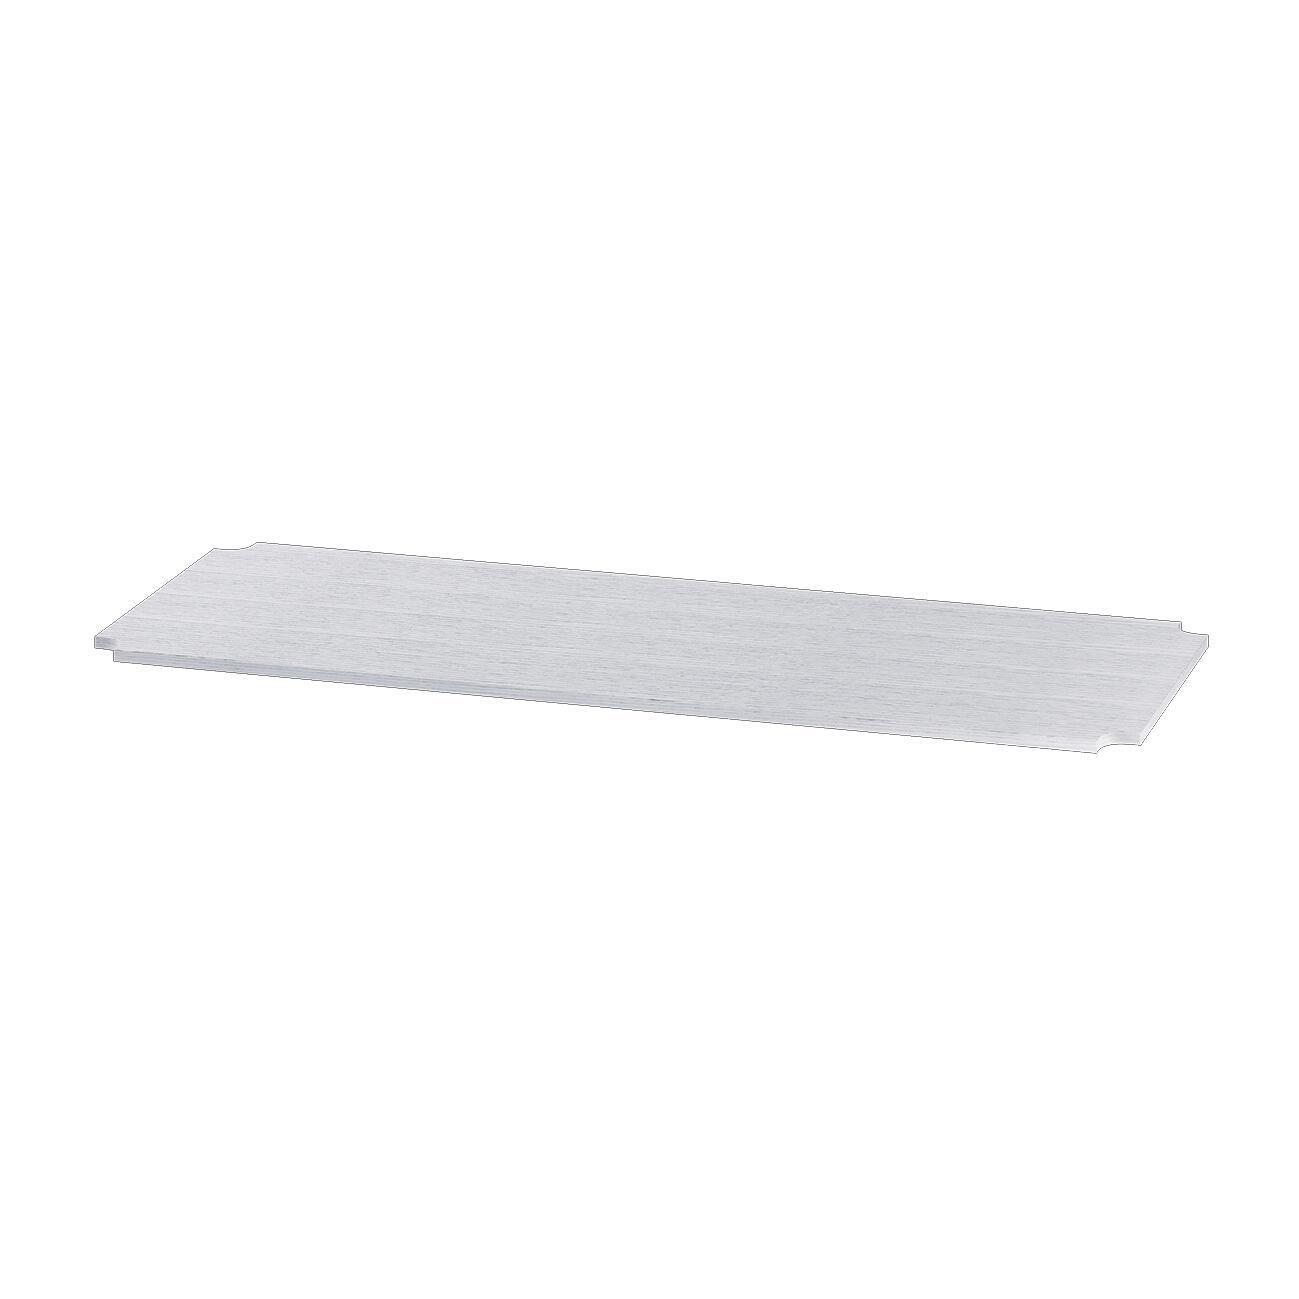 Mensola Spaceo Chrome Style+ L 35 x H 1 x P 35 cm bianco